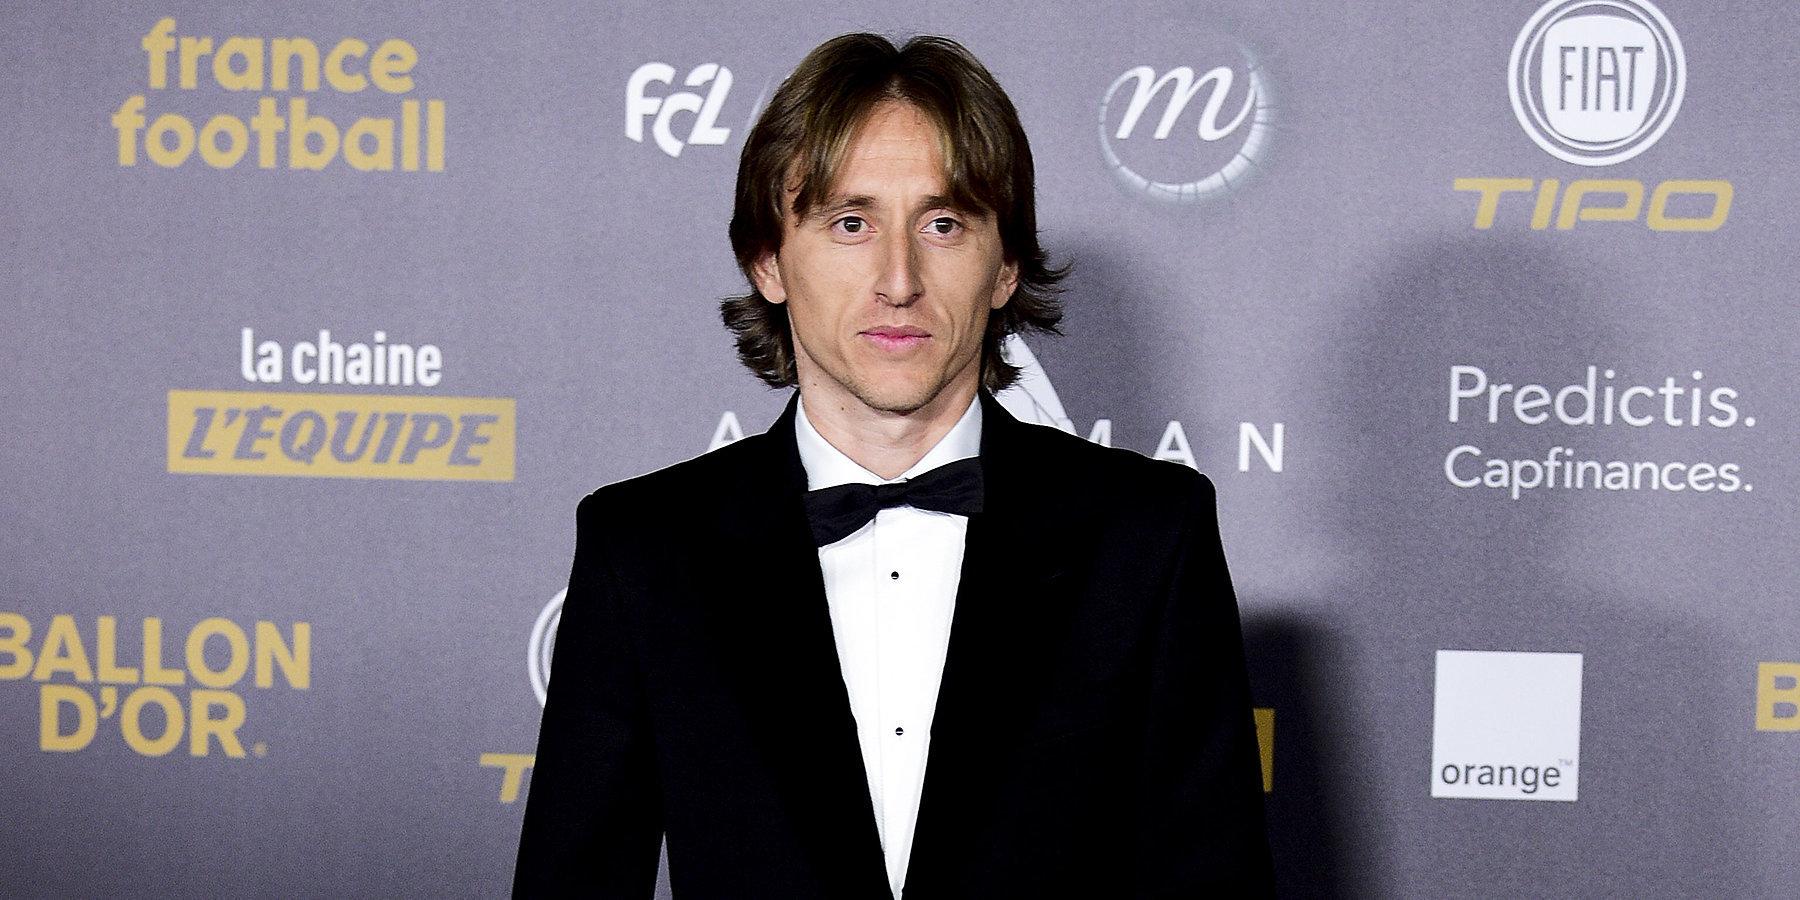 Лука Модрич стал обладателем «Золотого мяча»